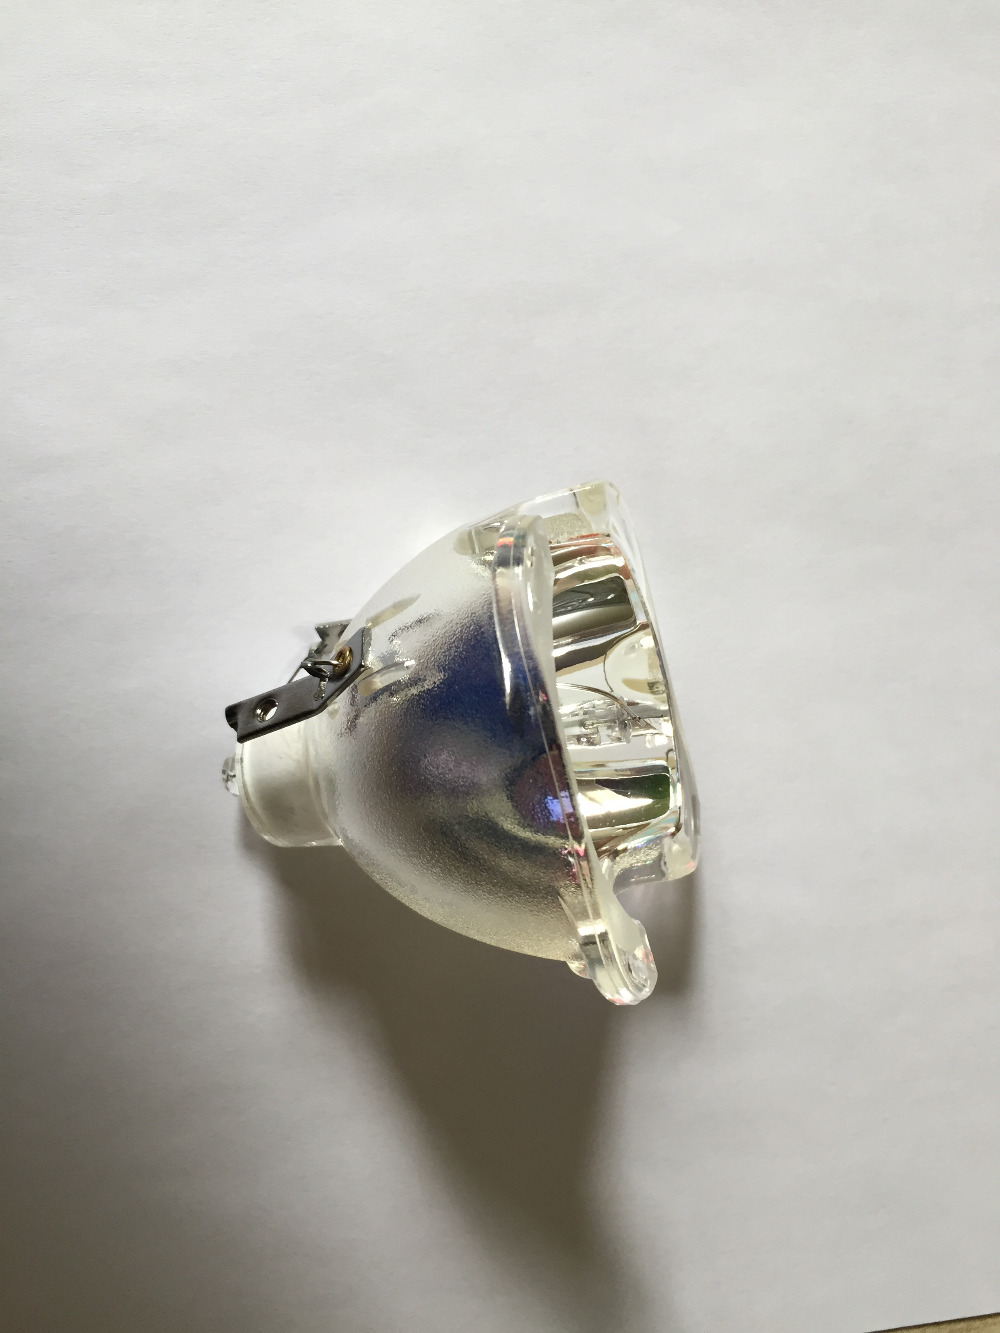 100% New Compatible bare lamp For BenQ  MP776 MP777 SP820 SP830 SP831 SP890 SP840 SP850 SP870 EP3735 EP3740 Projectors обувь для легкой атлетики health 789 777 706 820 830